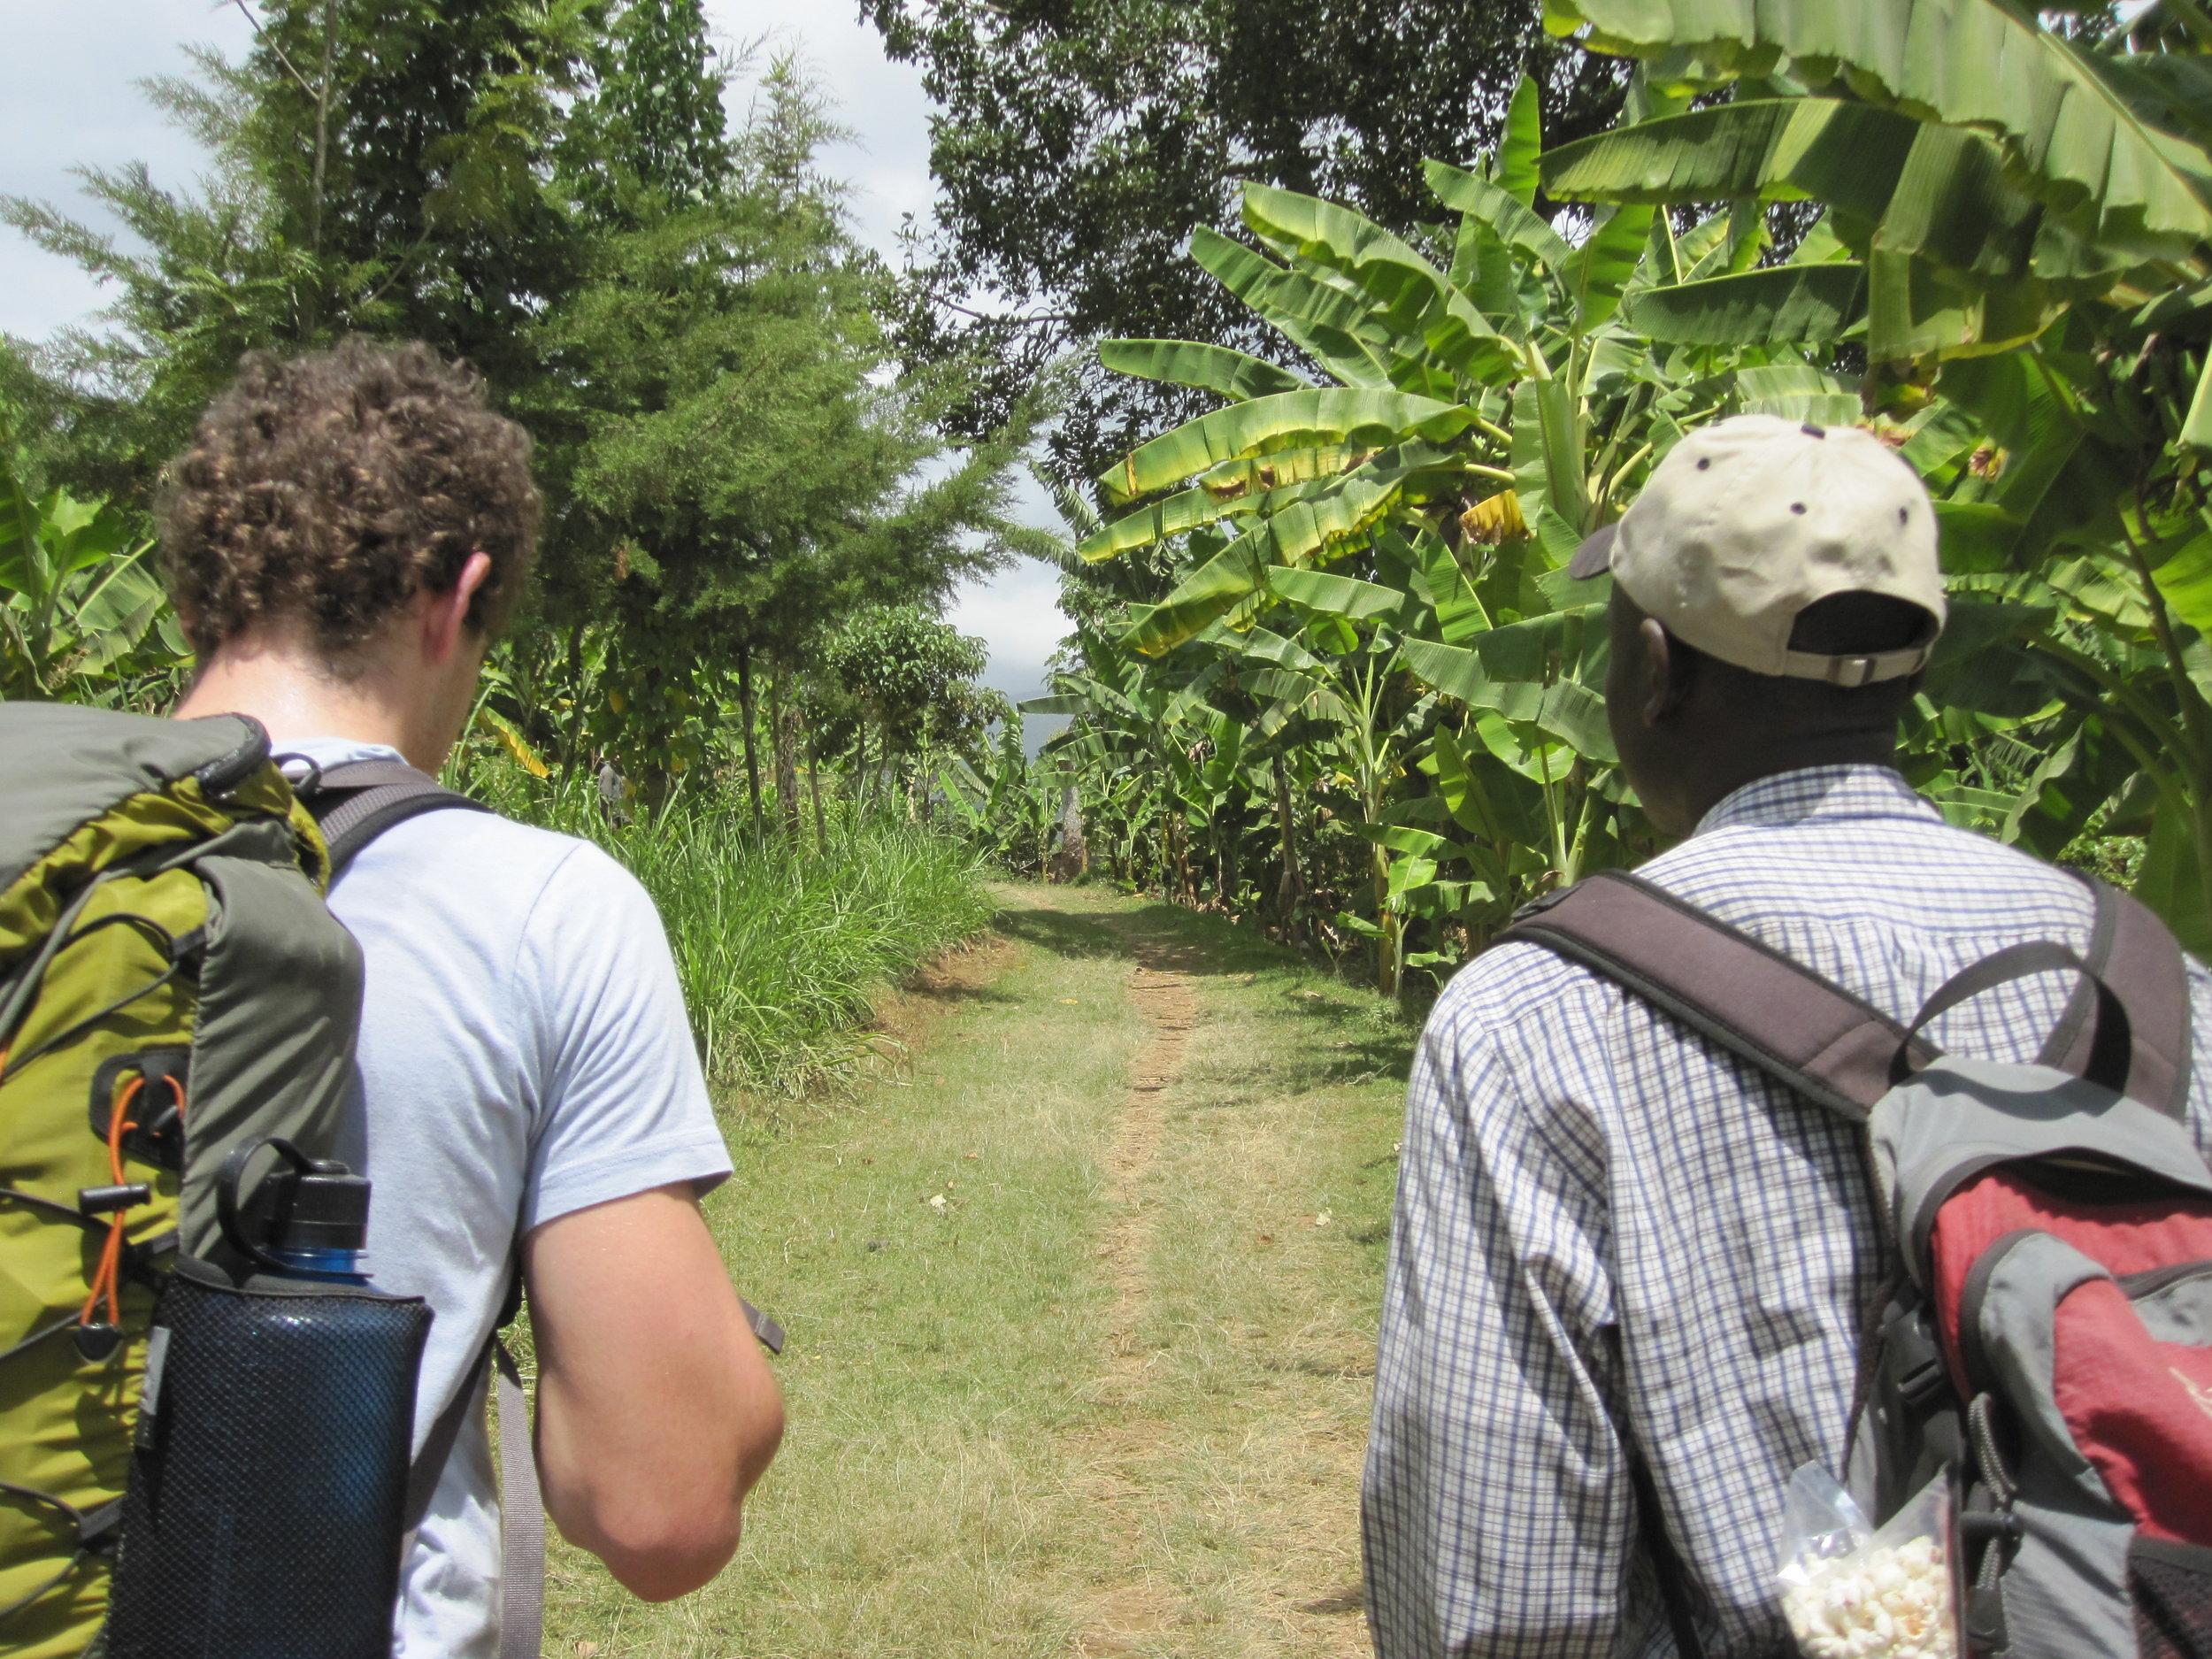 Exploring vegetation in Arusha